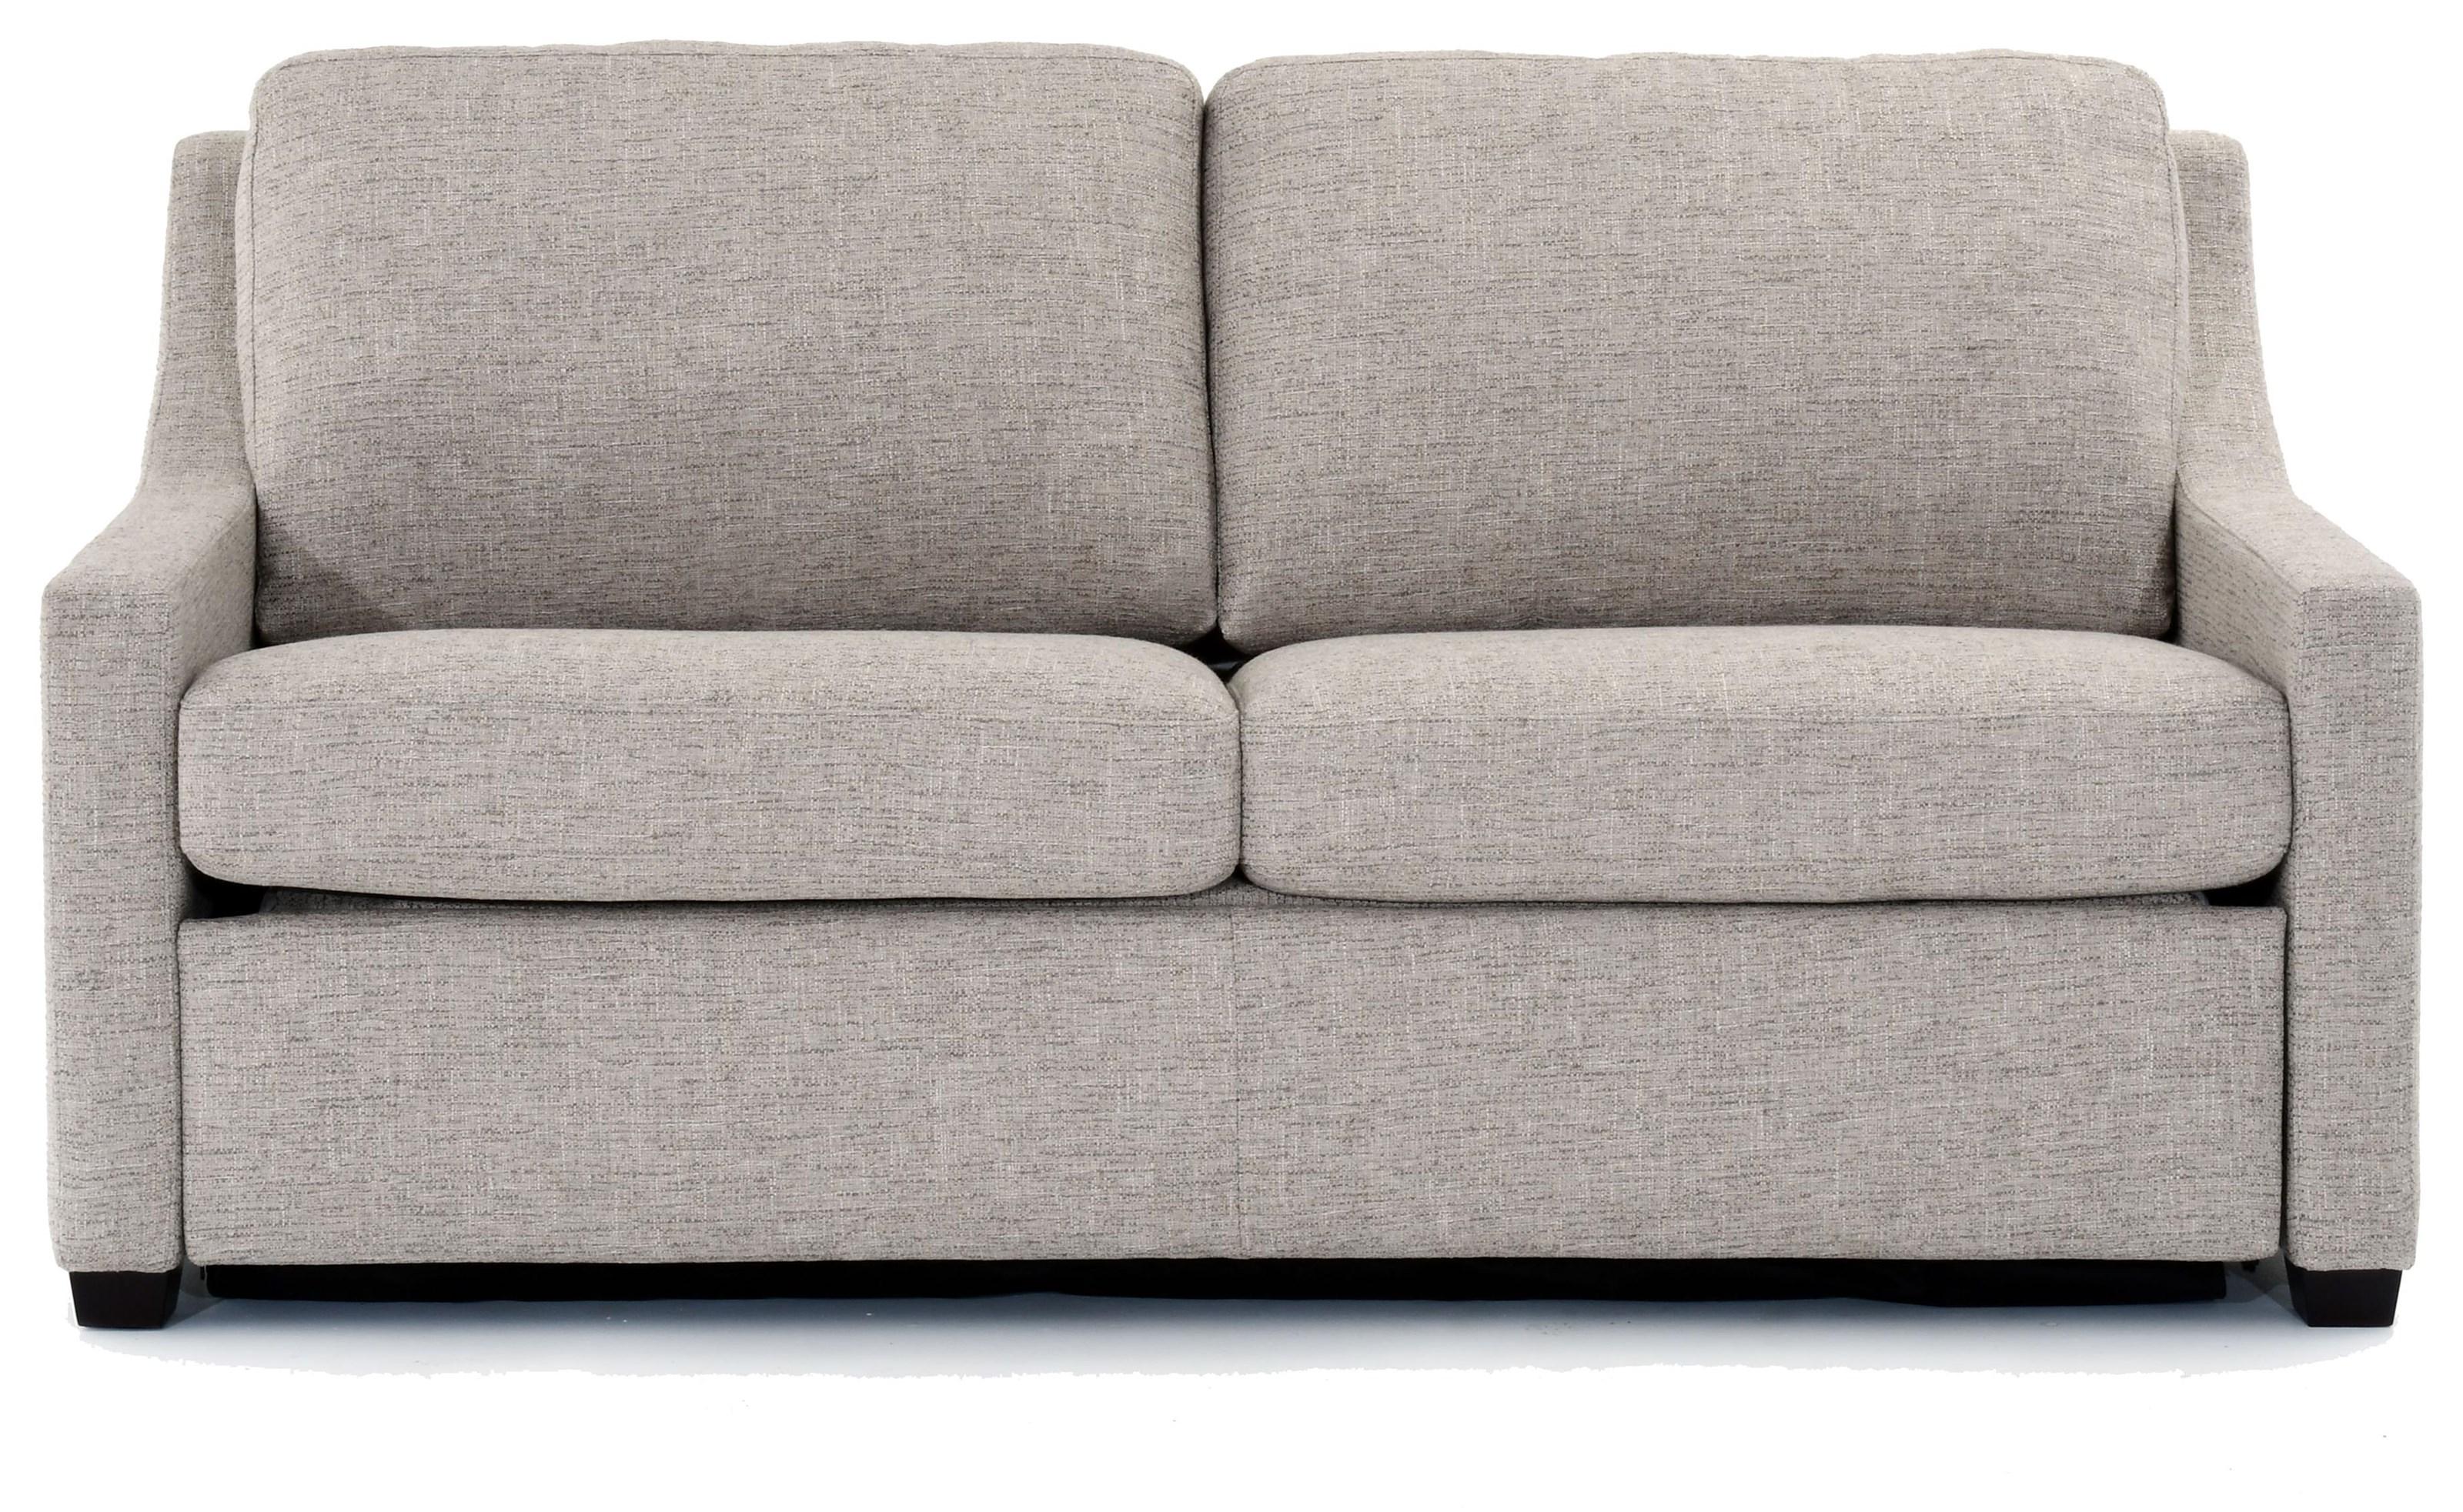 American Leather PerryQueen Sleeper Sofa ...